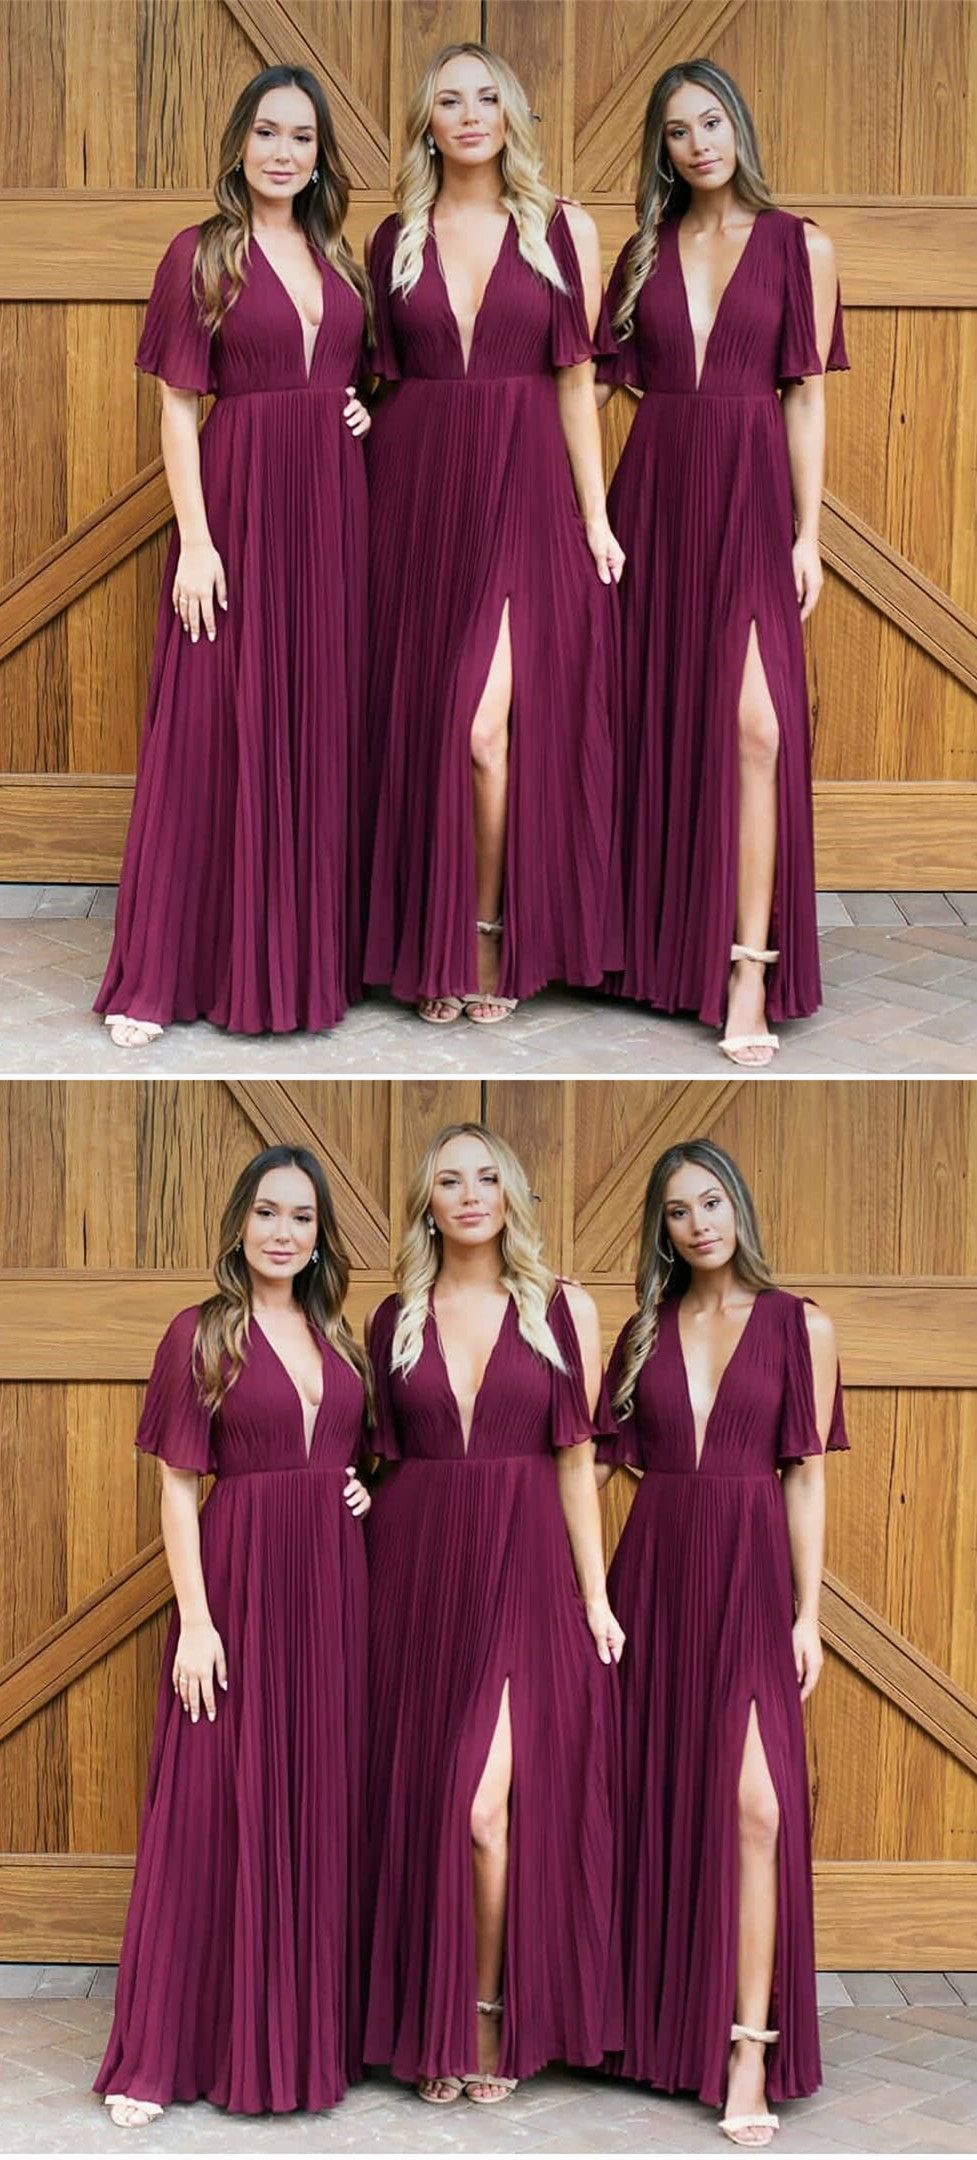 Aline vneck pleats dark red chiffon bridesmaid dress with split in